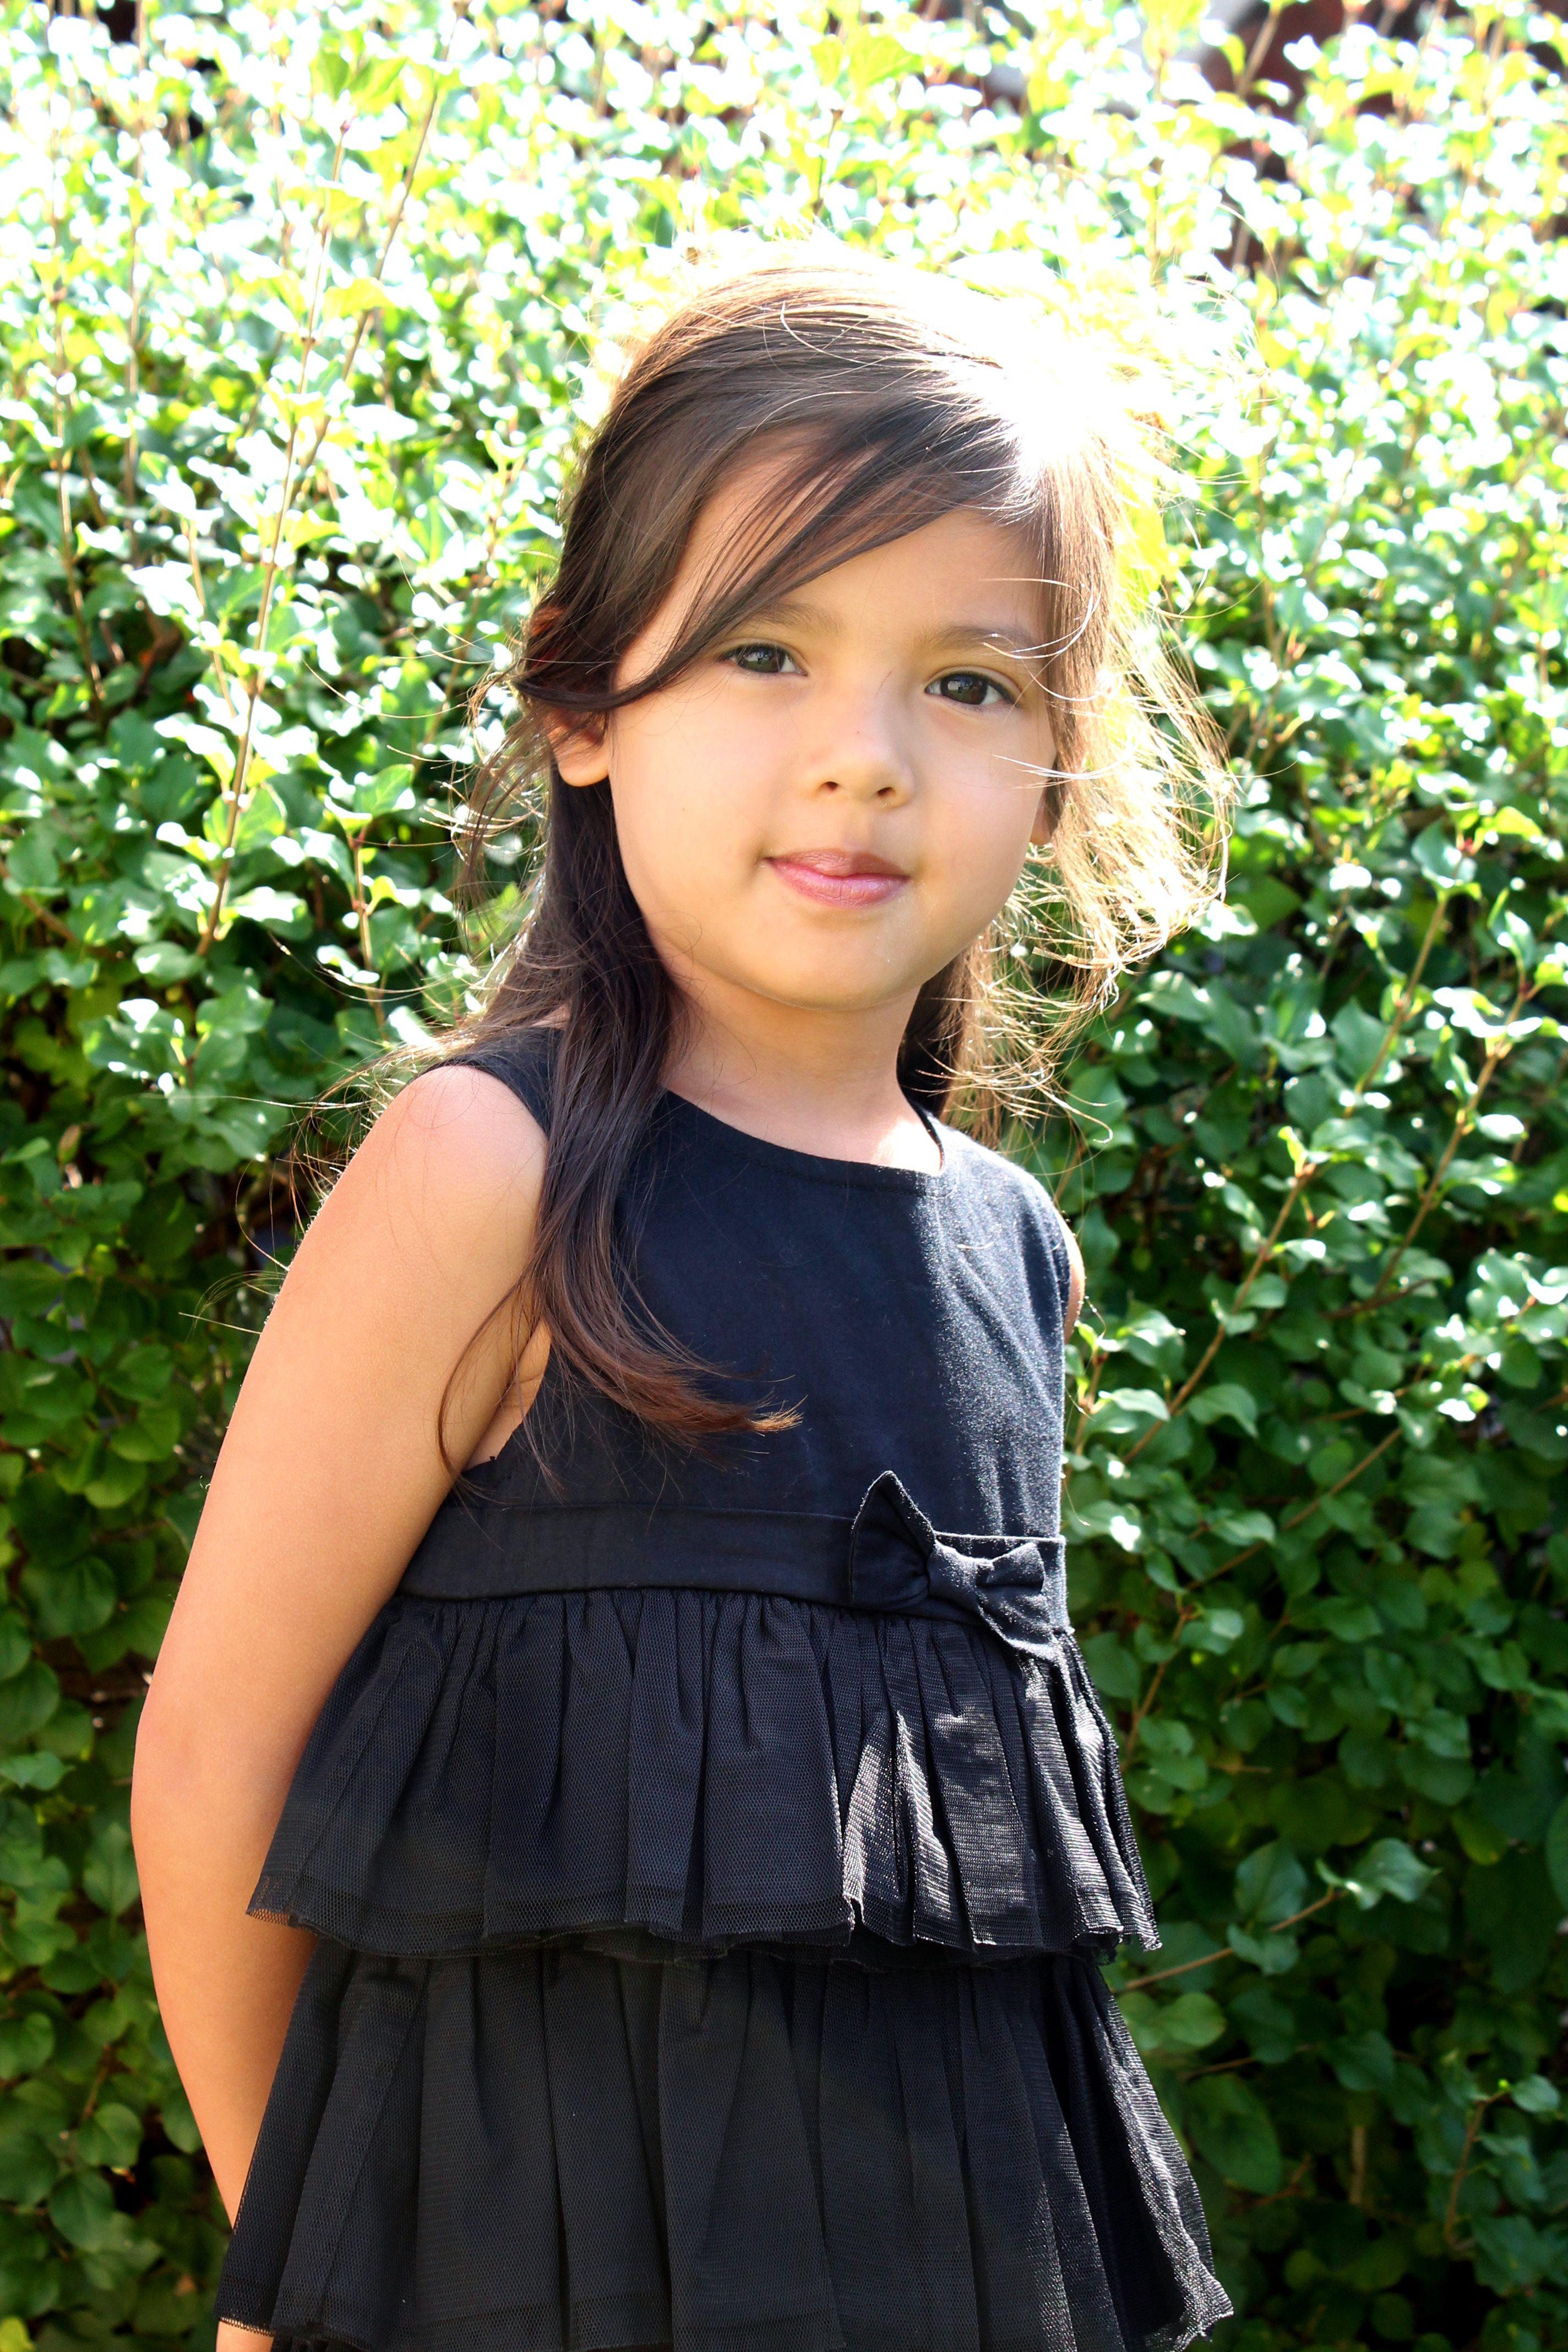 Niagara childrens photographer